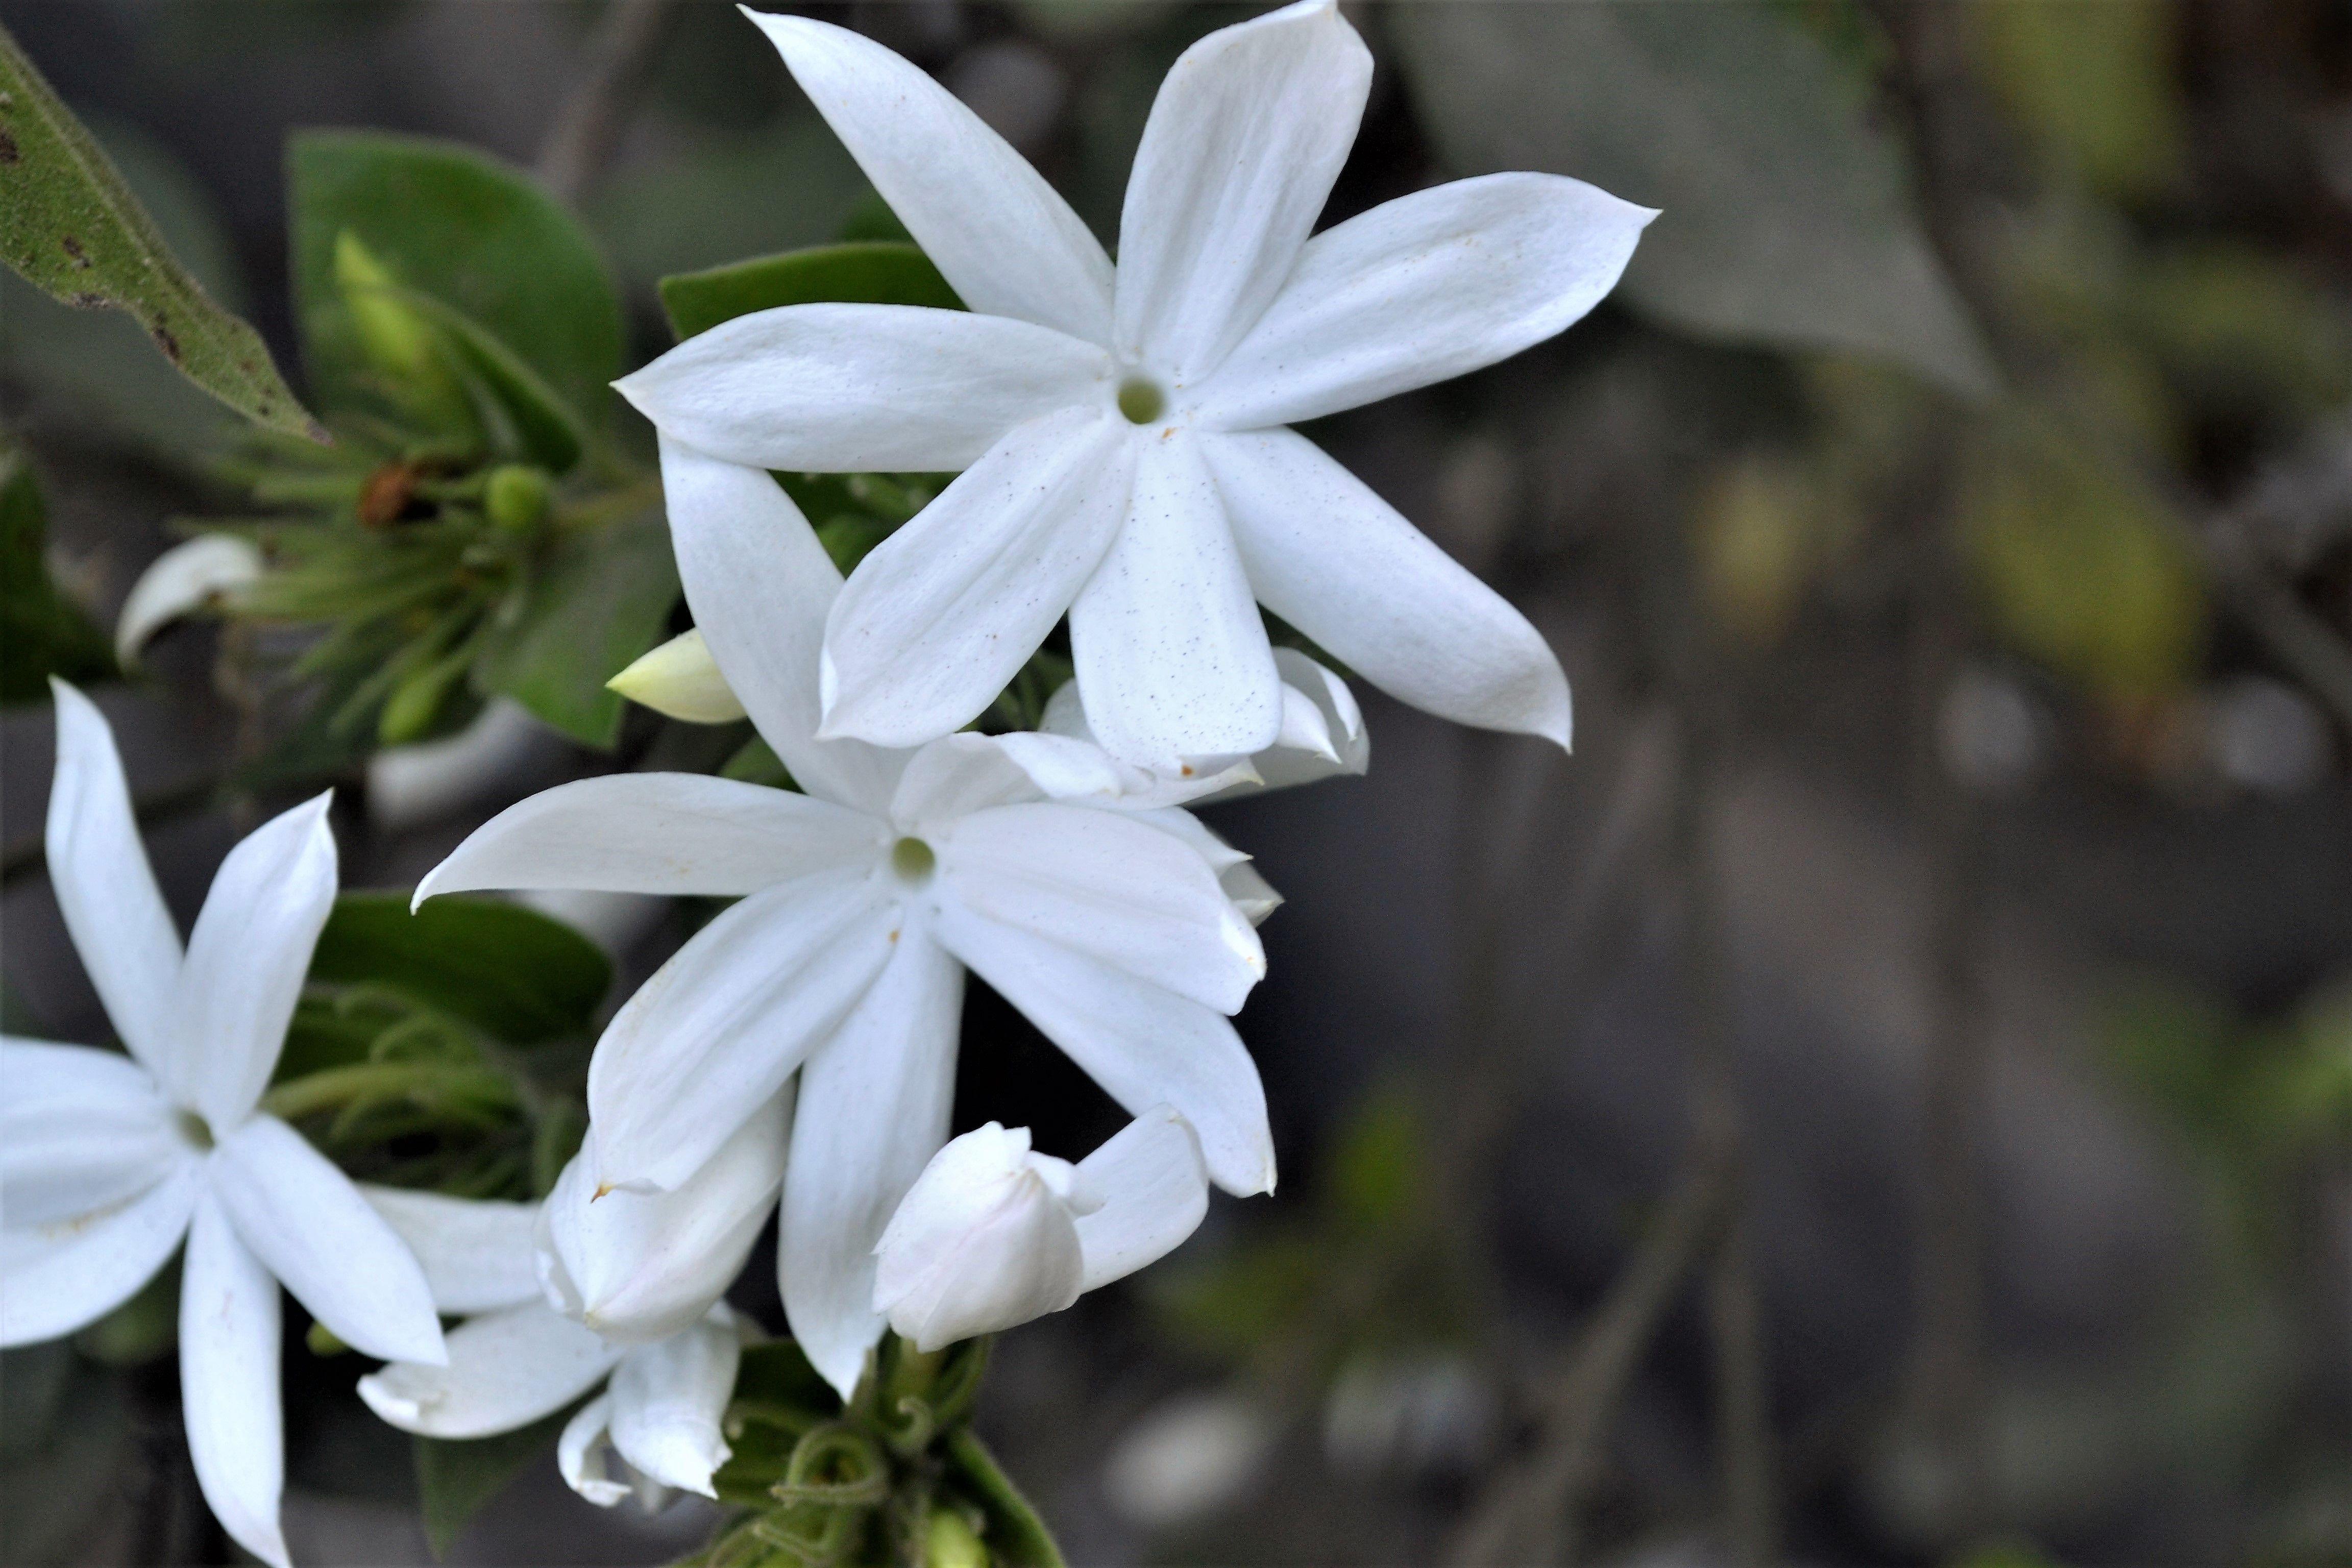 star jasmine chinese star jassamine confederate jasmine 5a53bb920c1a a7a